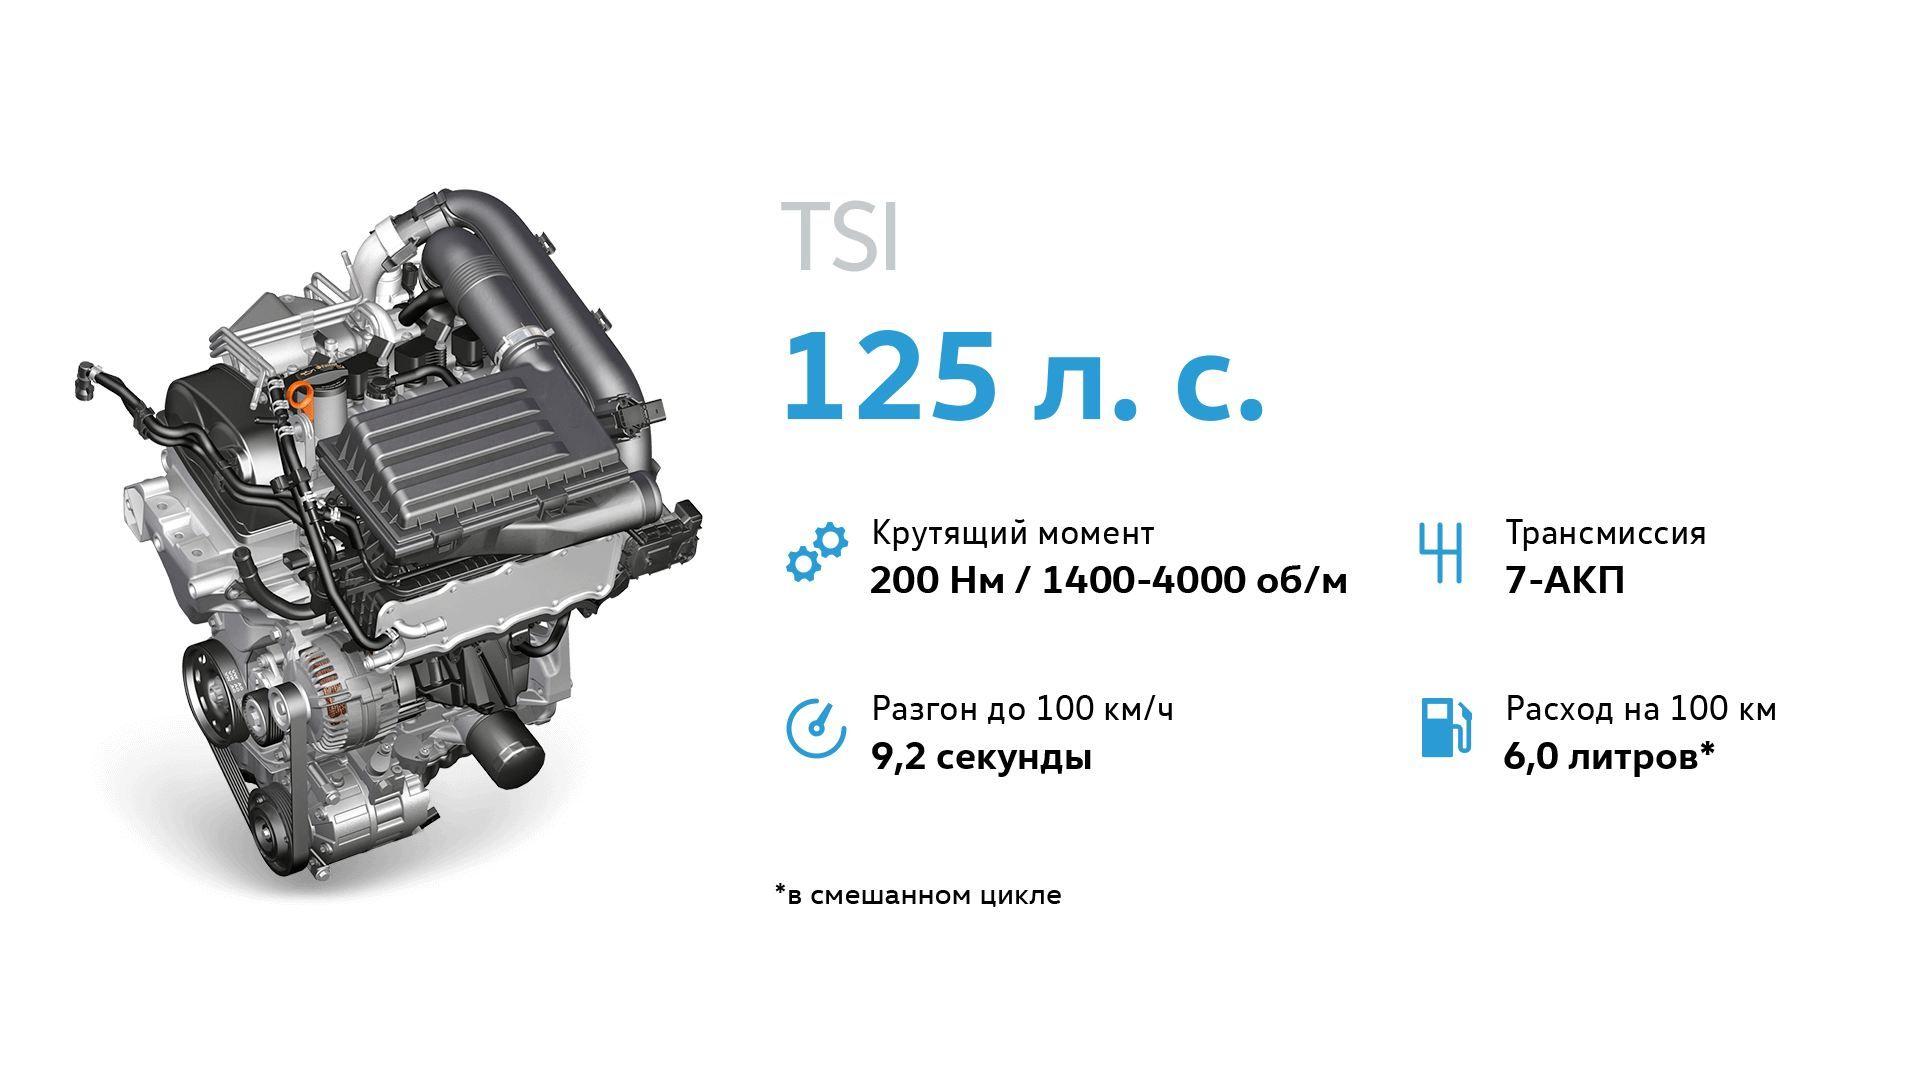 Двигатель Volkswagen TSI 125 л. с..